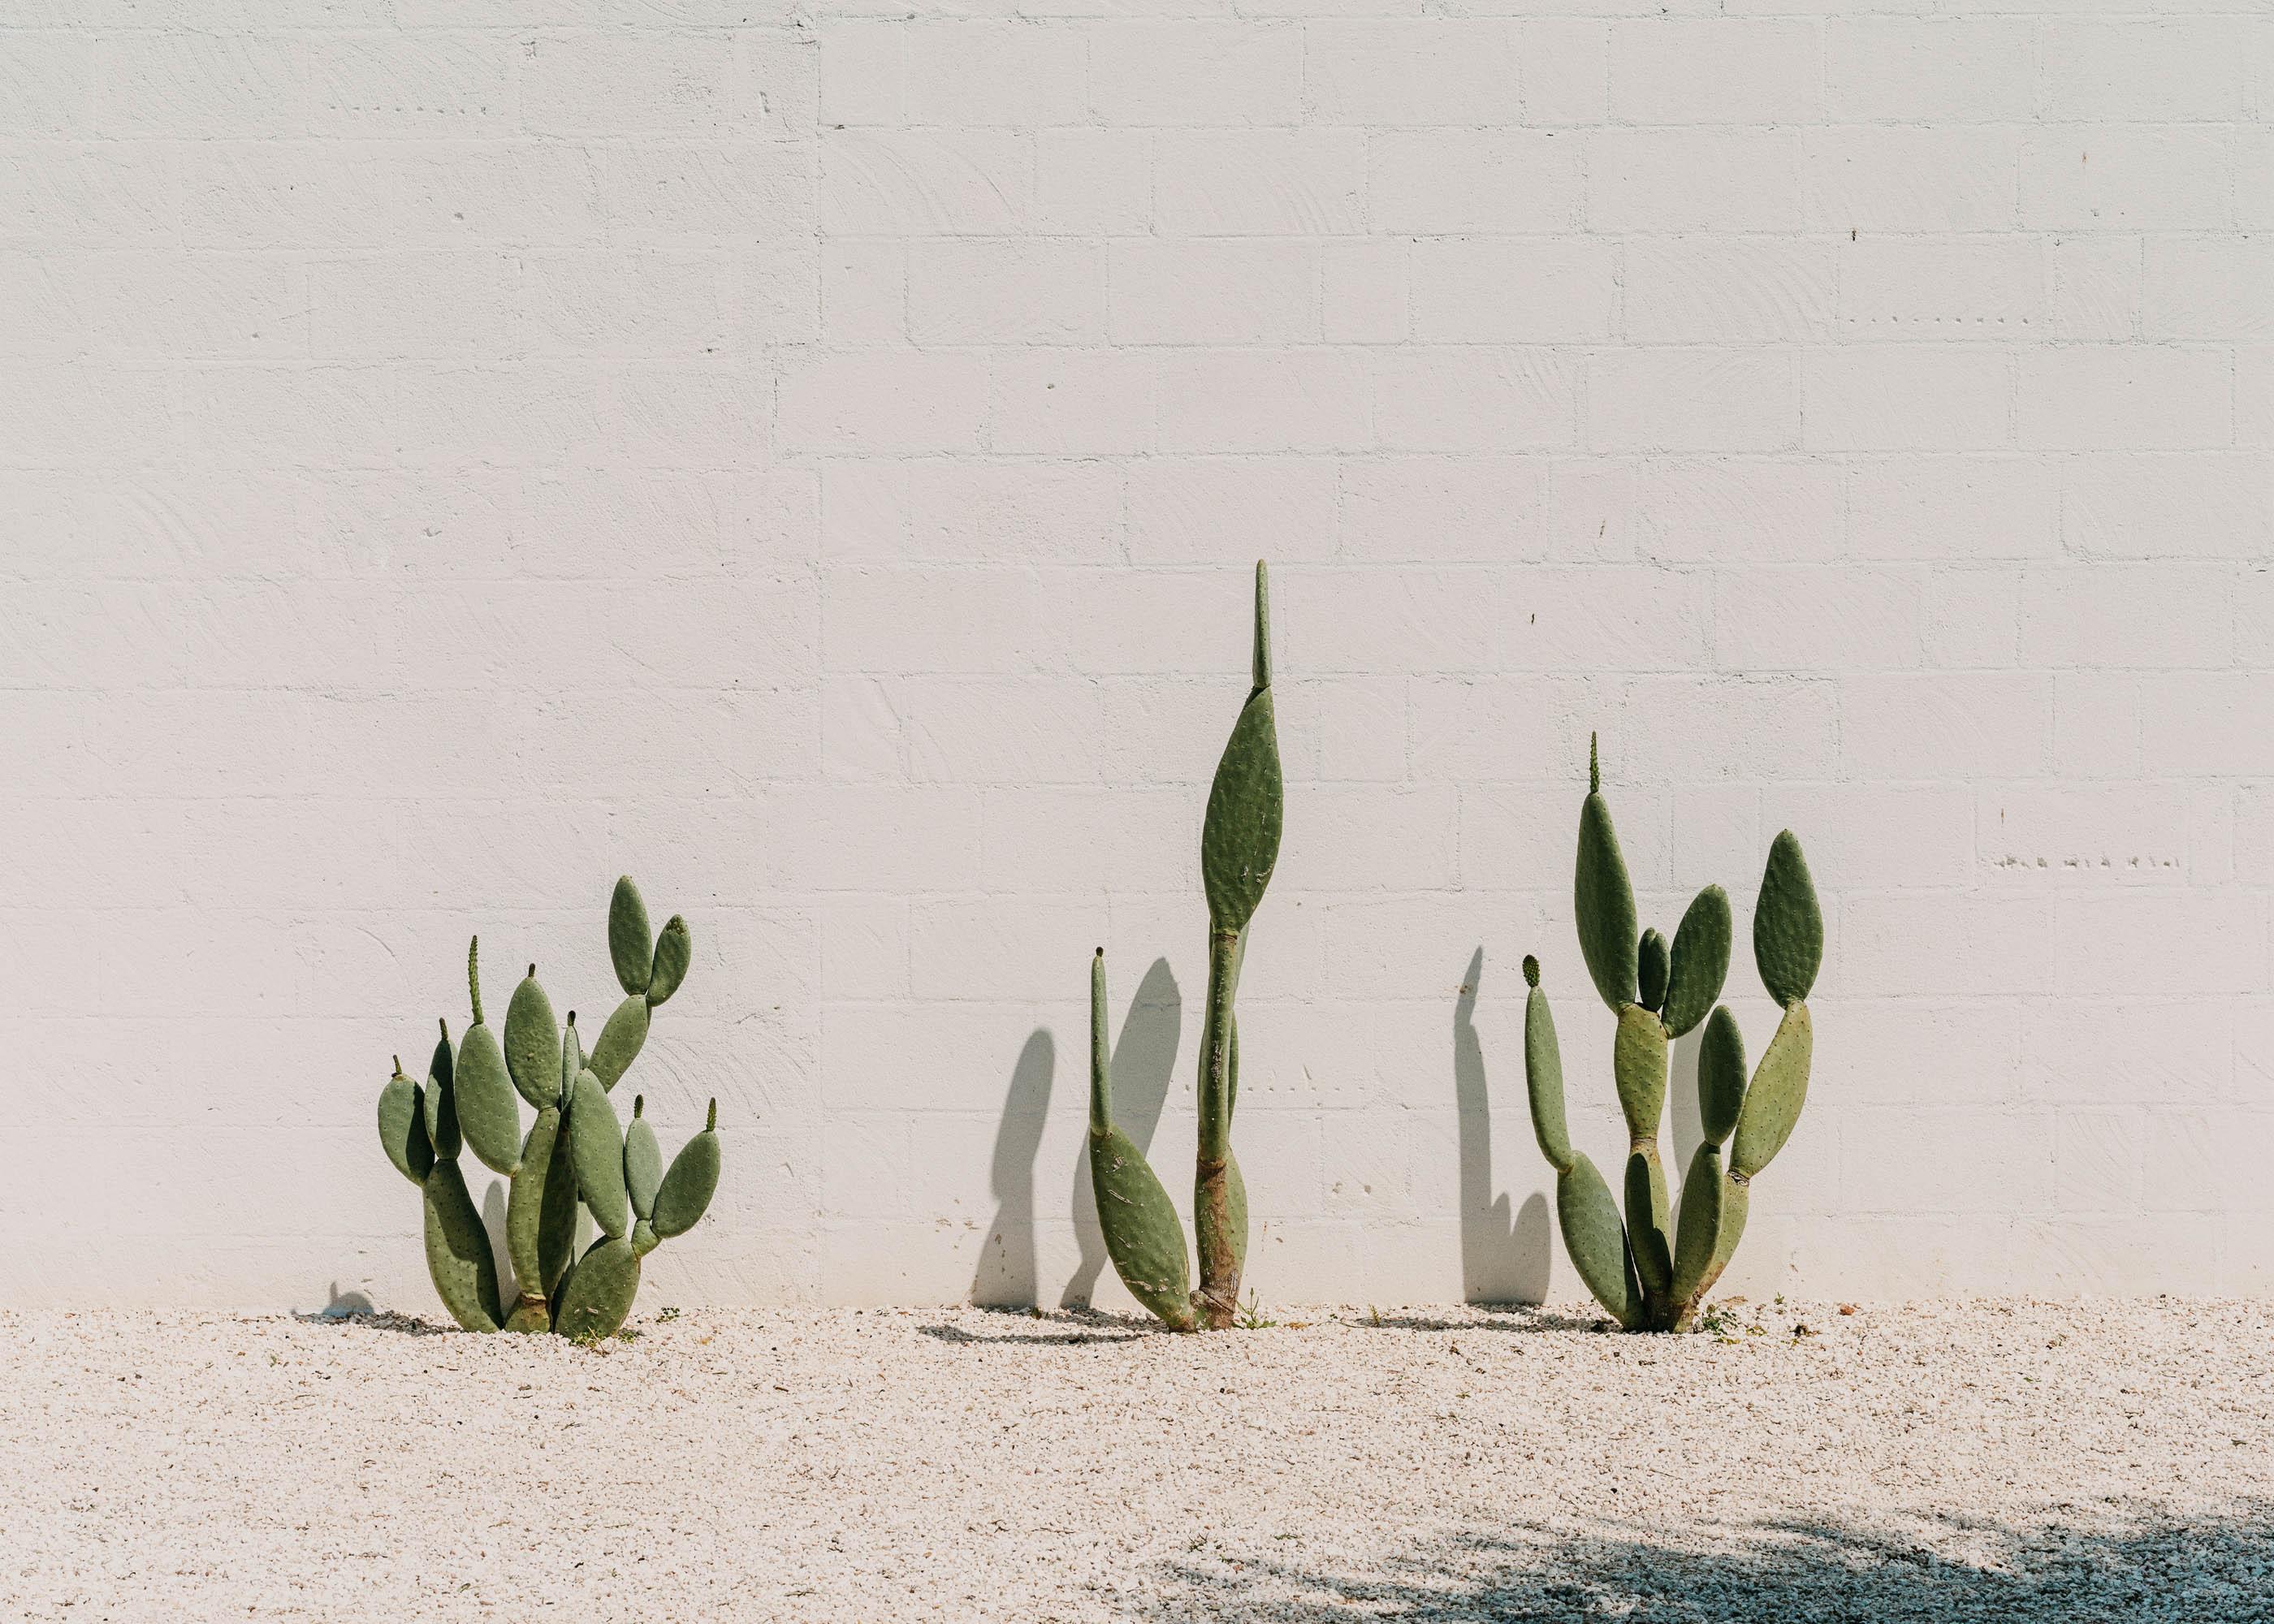 #italy #puglia #masseria #morosseta #openhouse #plants #vegetal #cactus